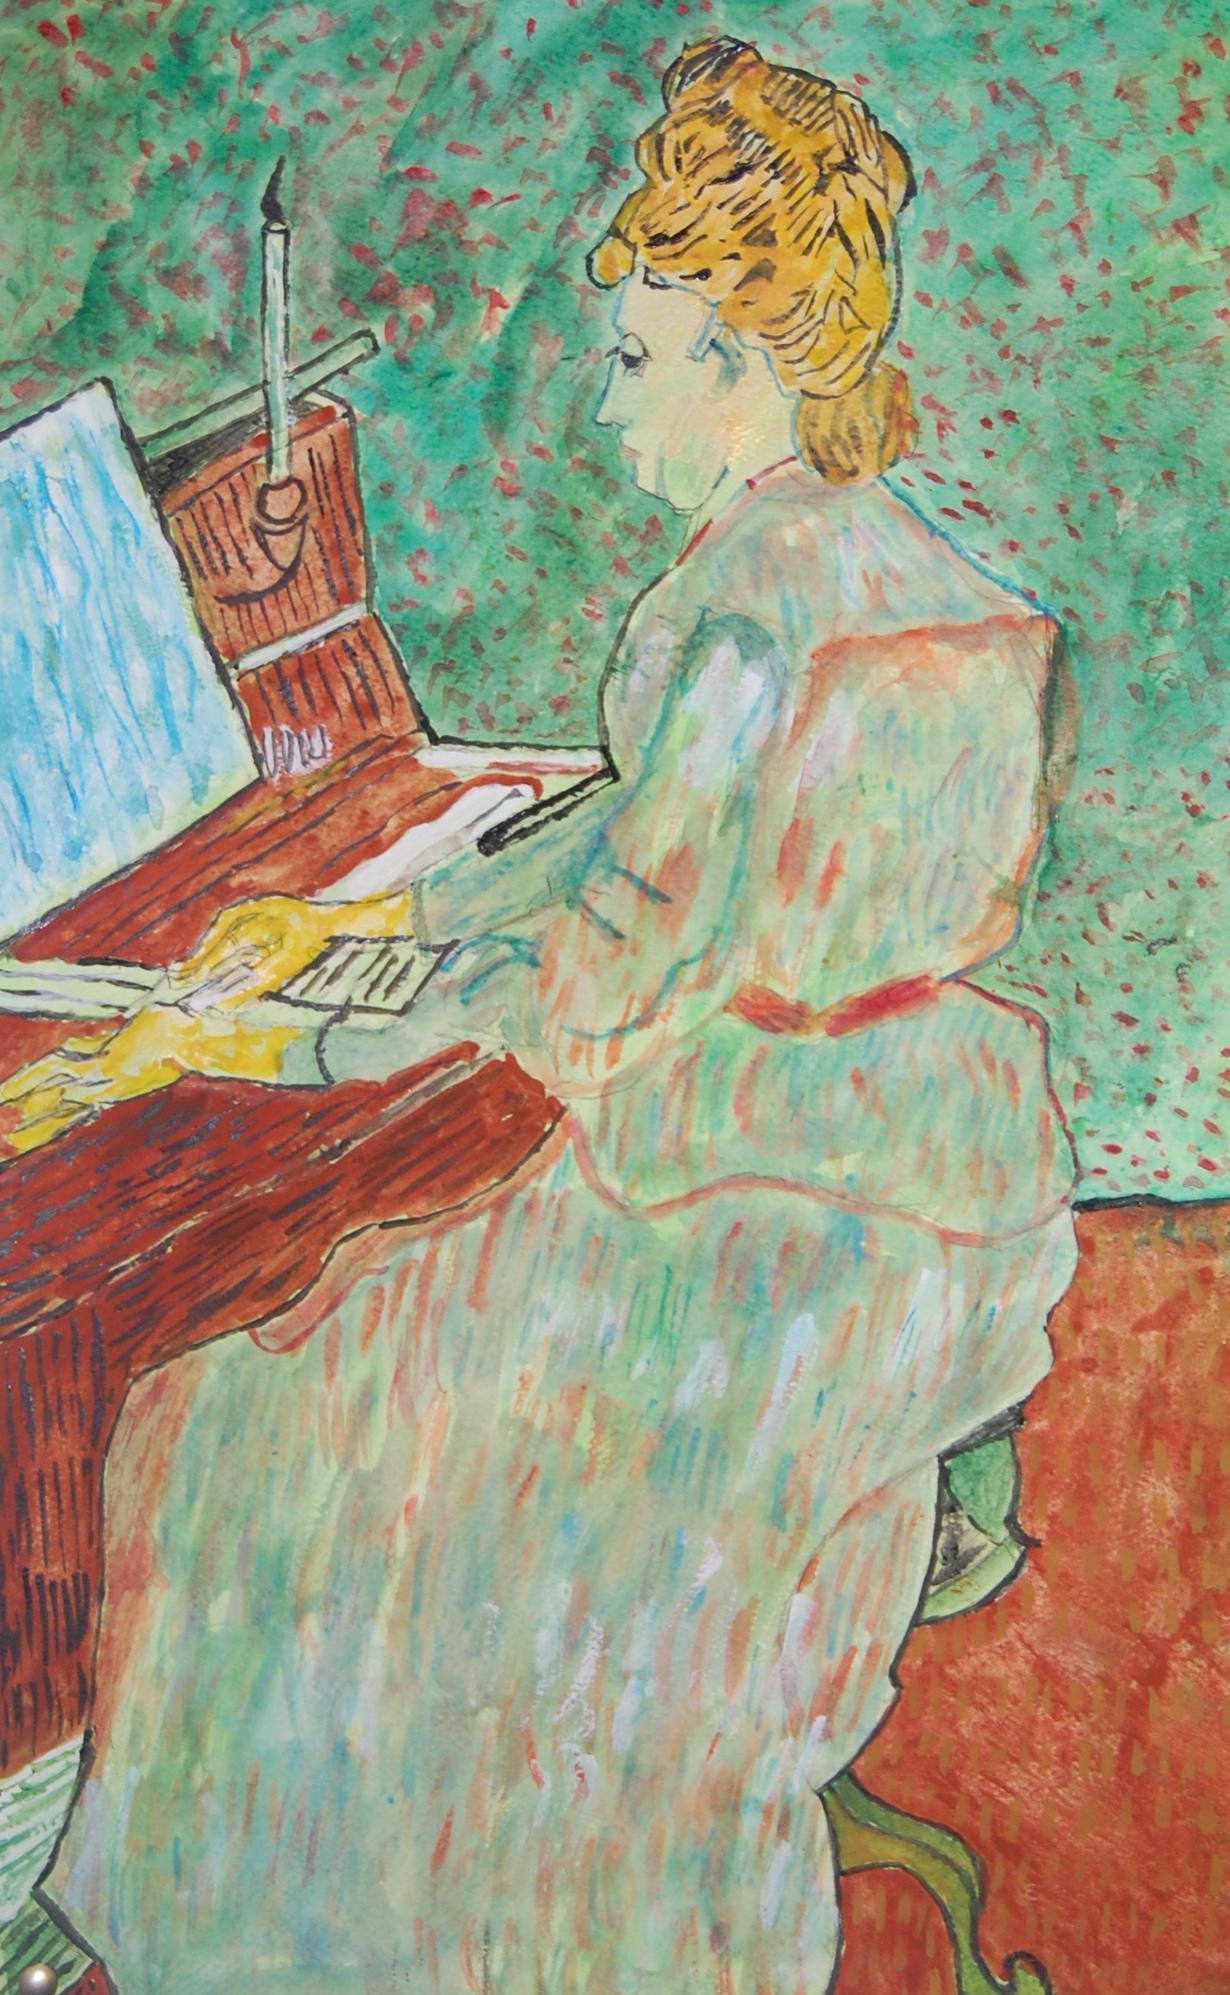 6899 || 2122 || Van Gogh copy ||  ||